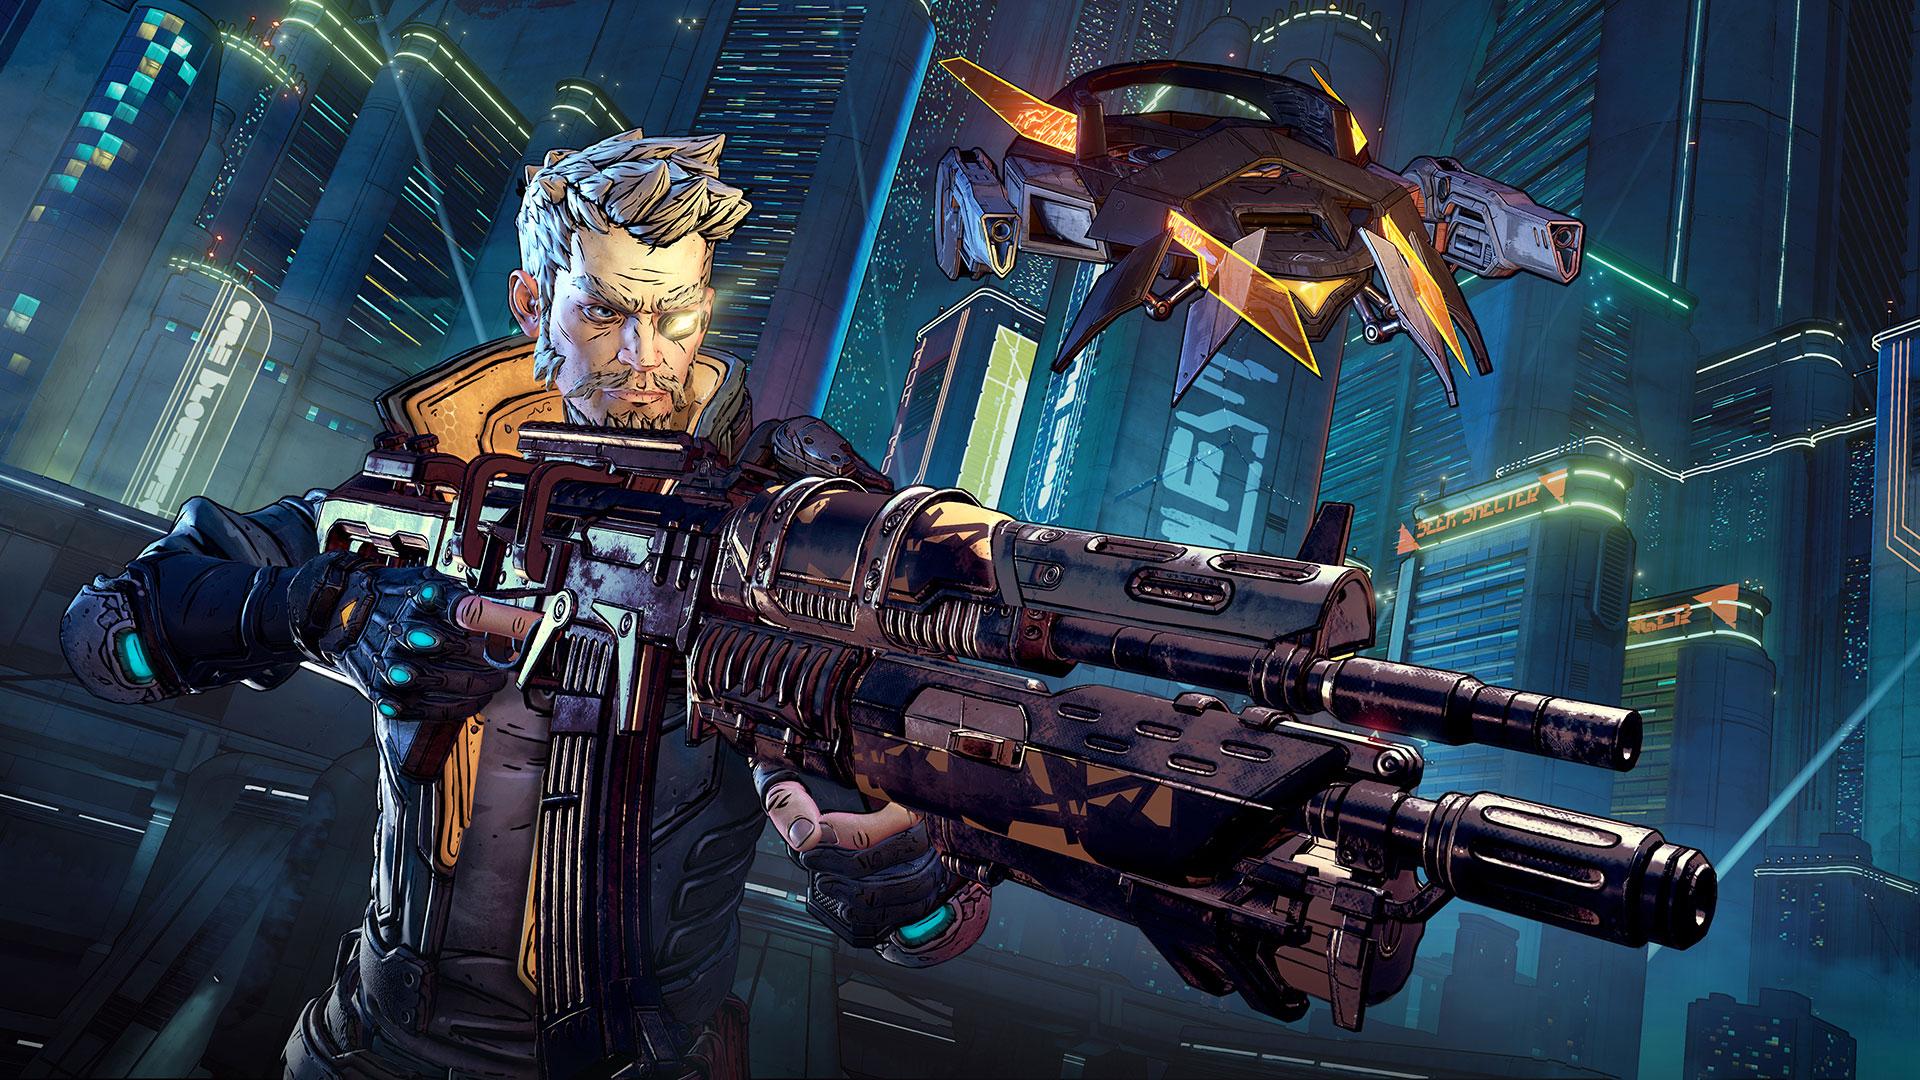 Showing off a large gun in Borderlands 3